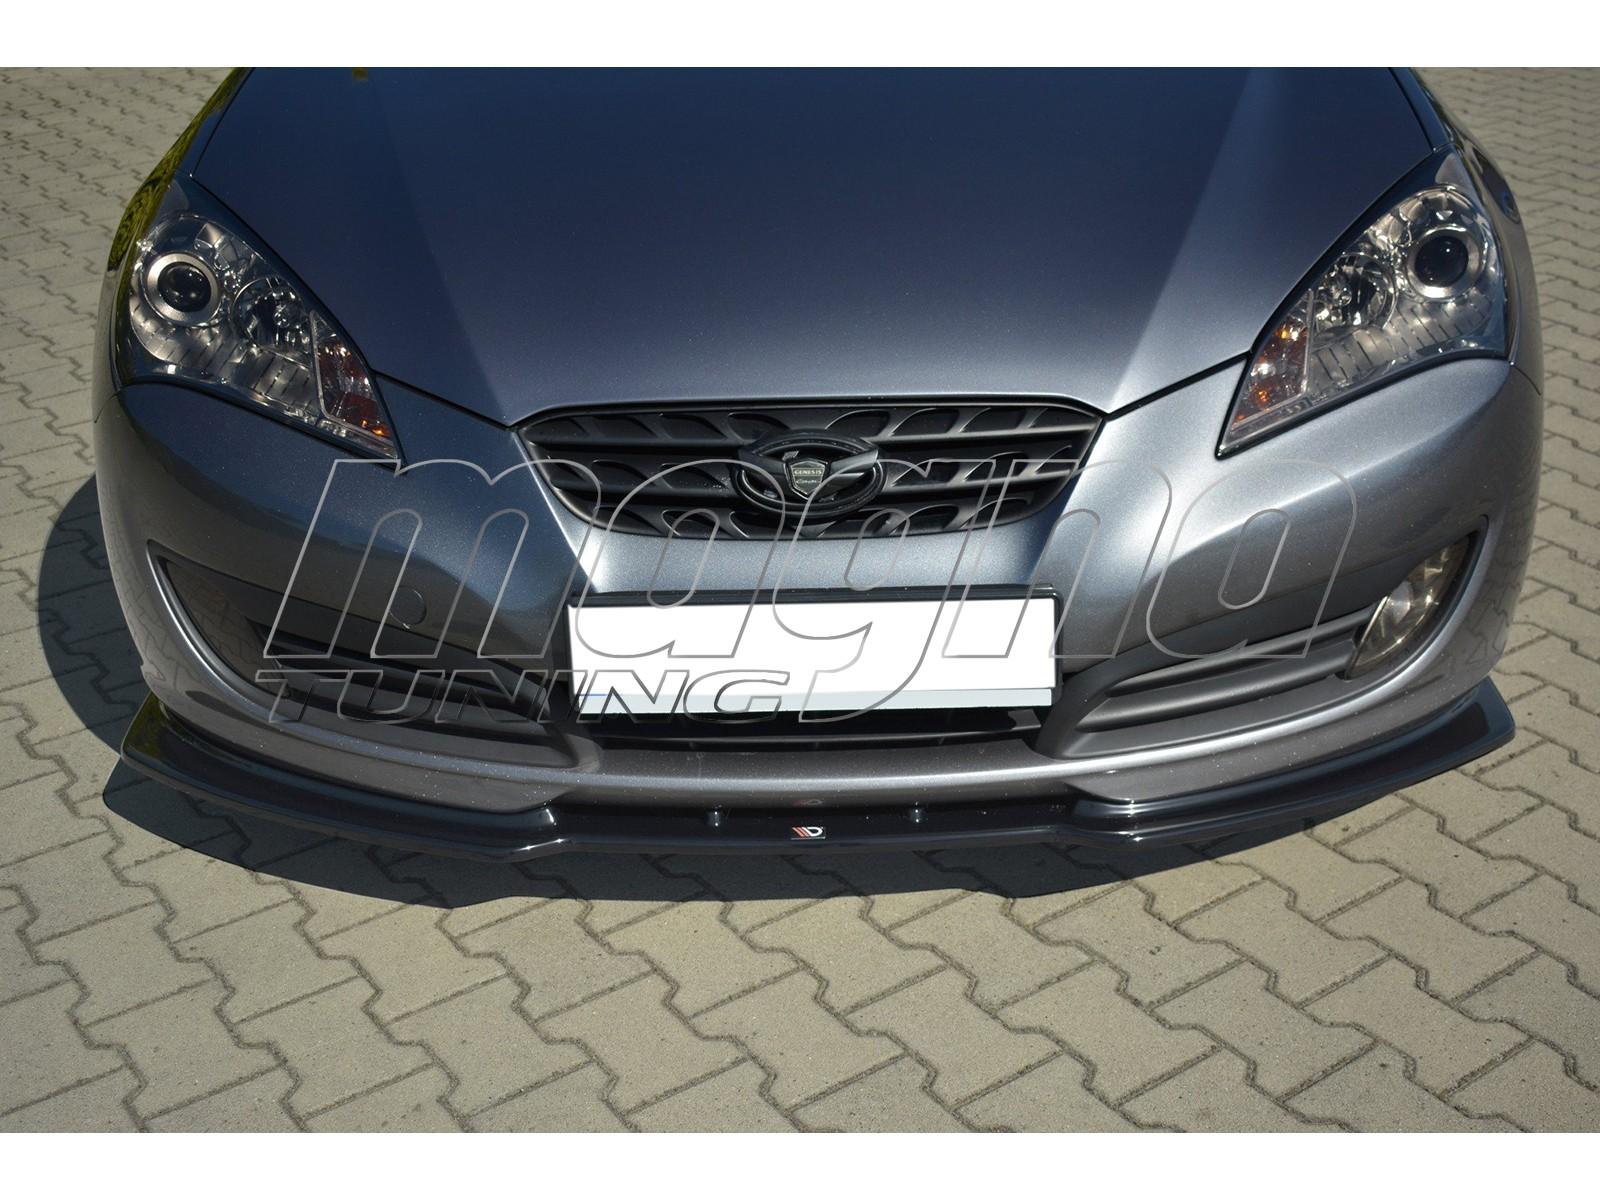 Hyundai Genesis Coupe MX Front Bumper Extension